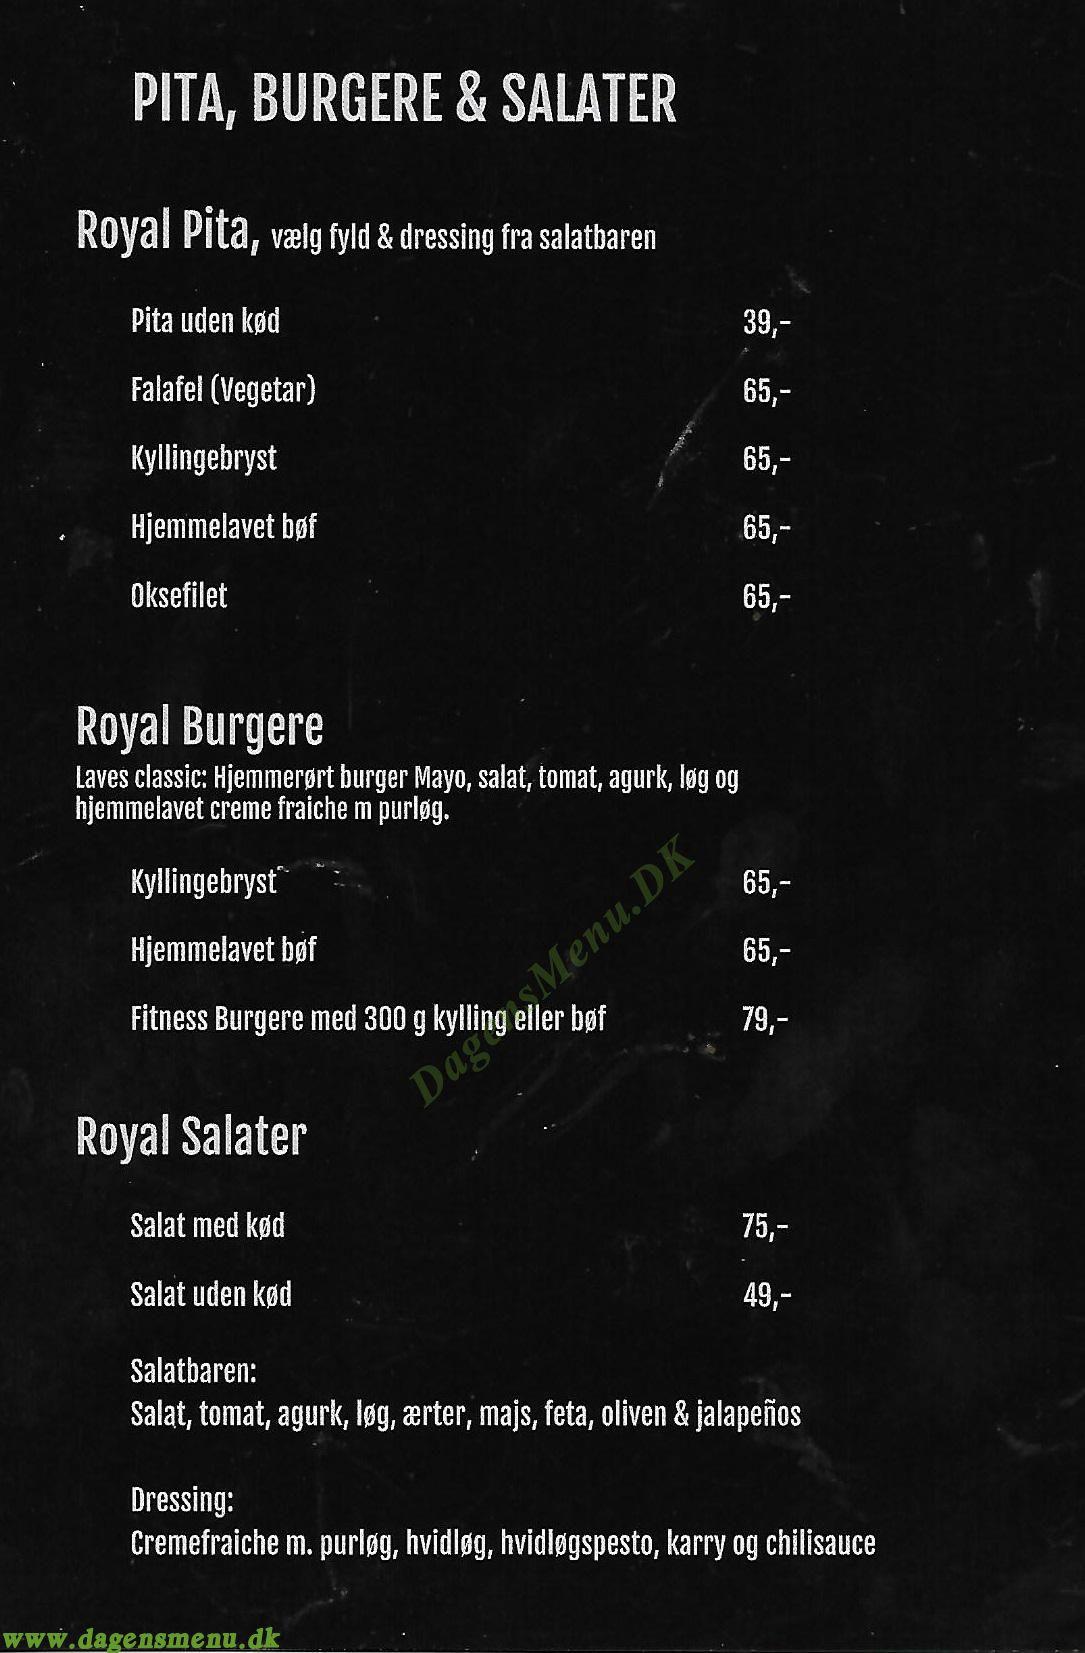 Royal Pita & Burger - Menukort